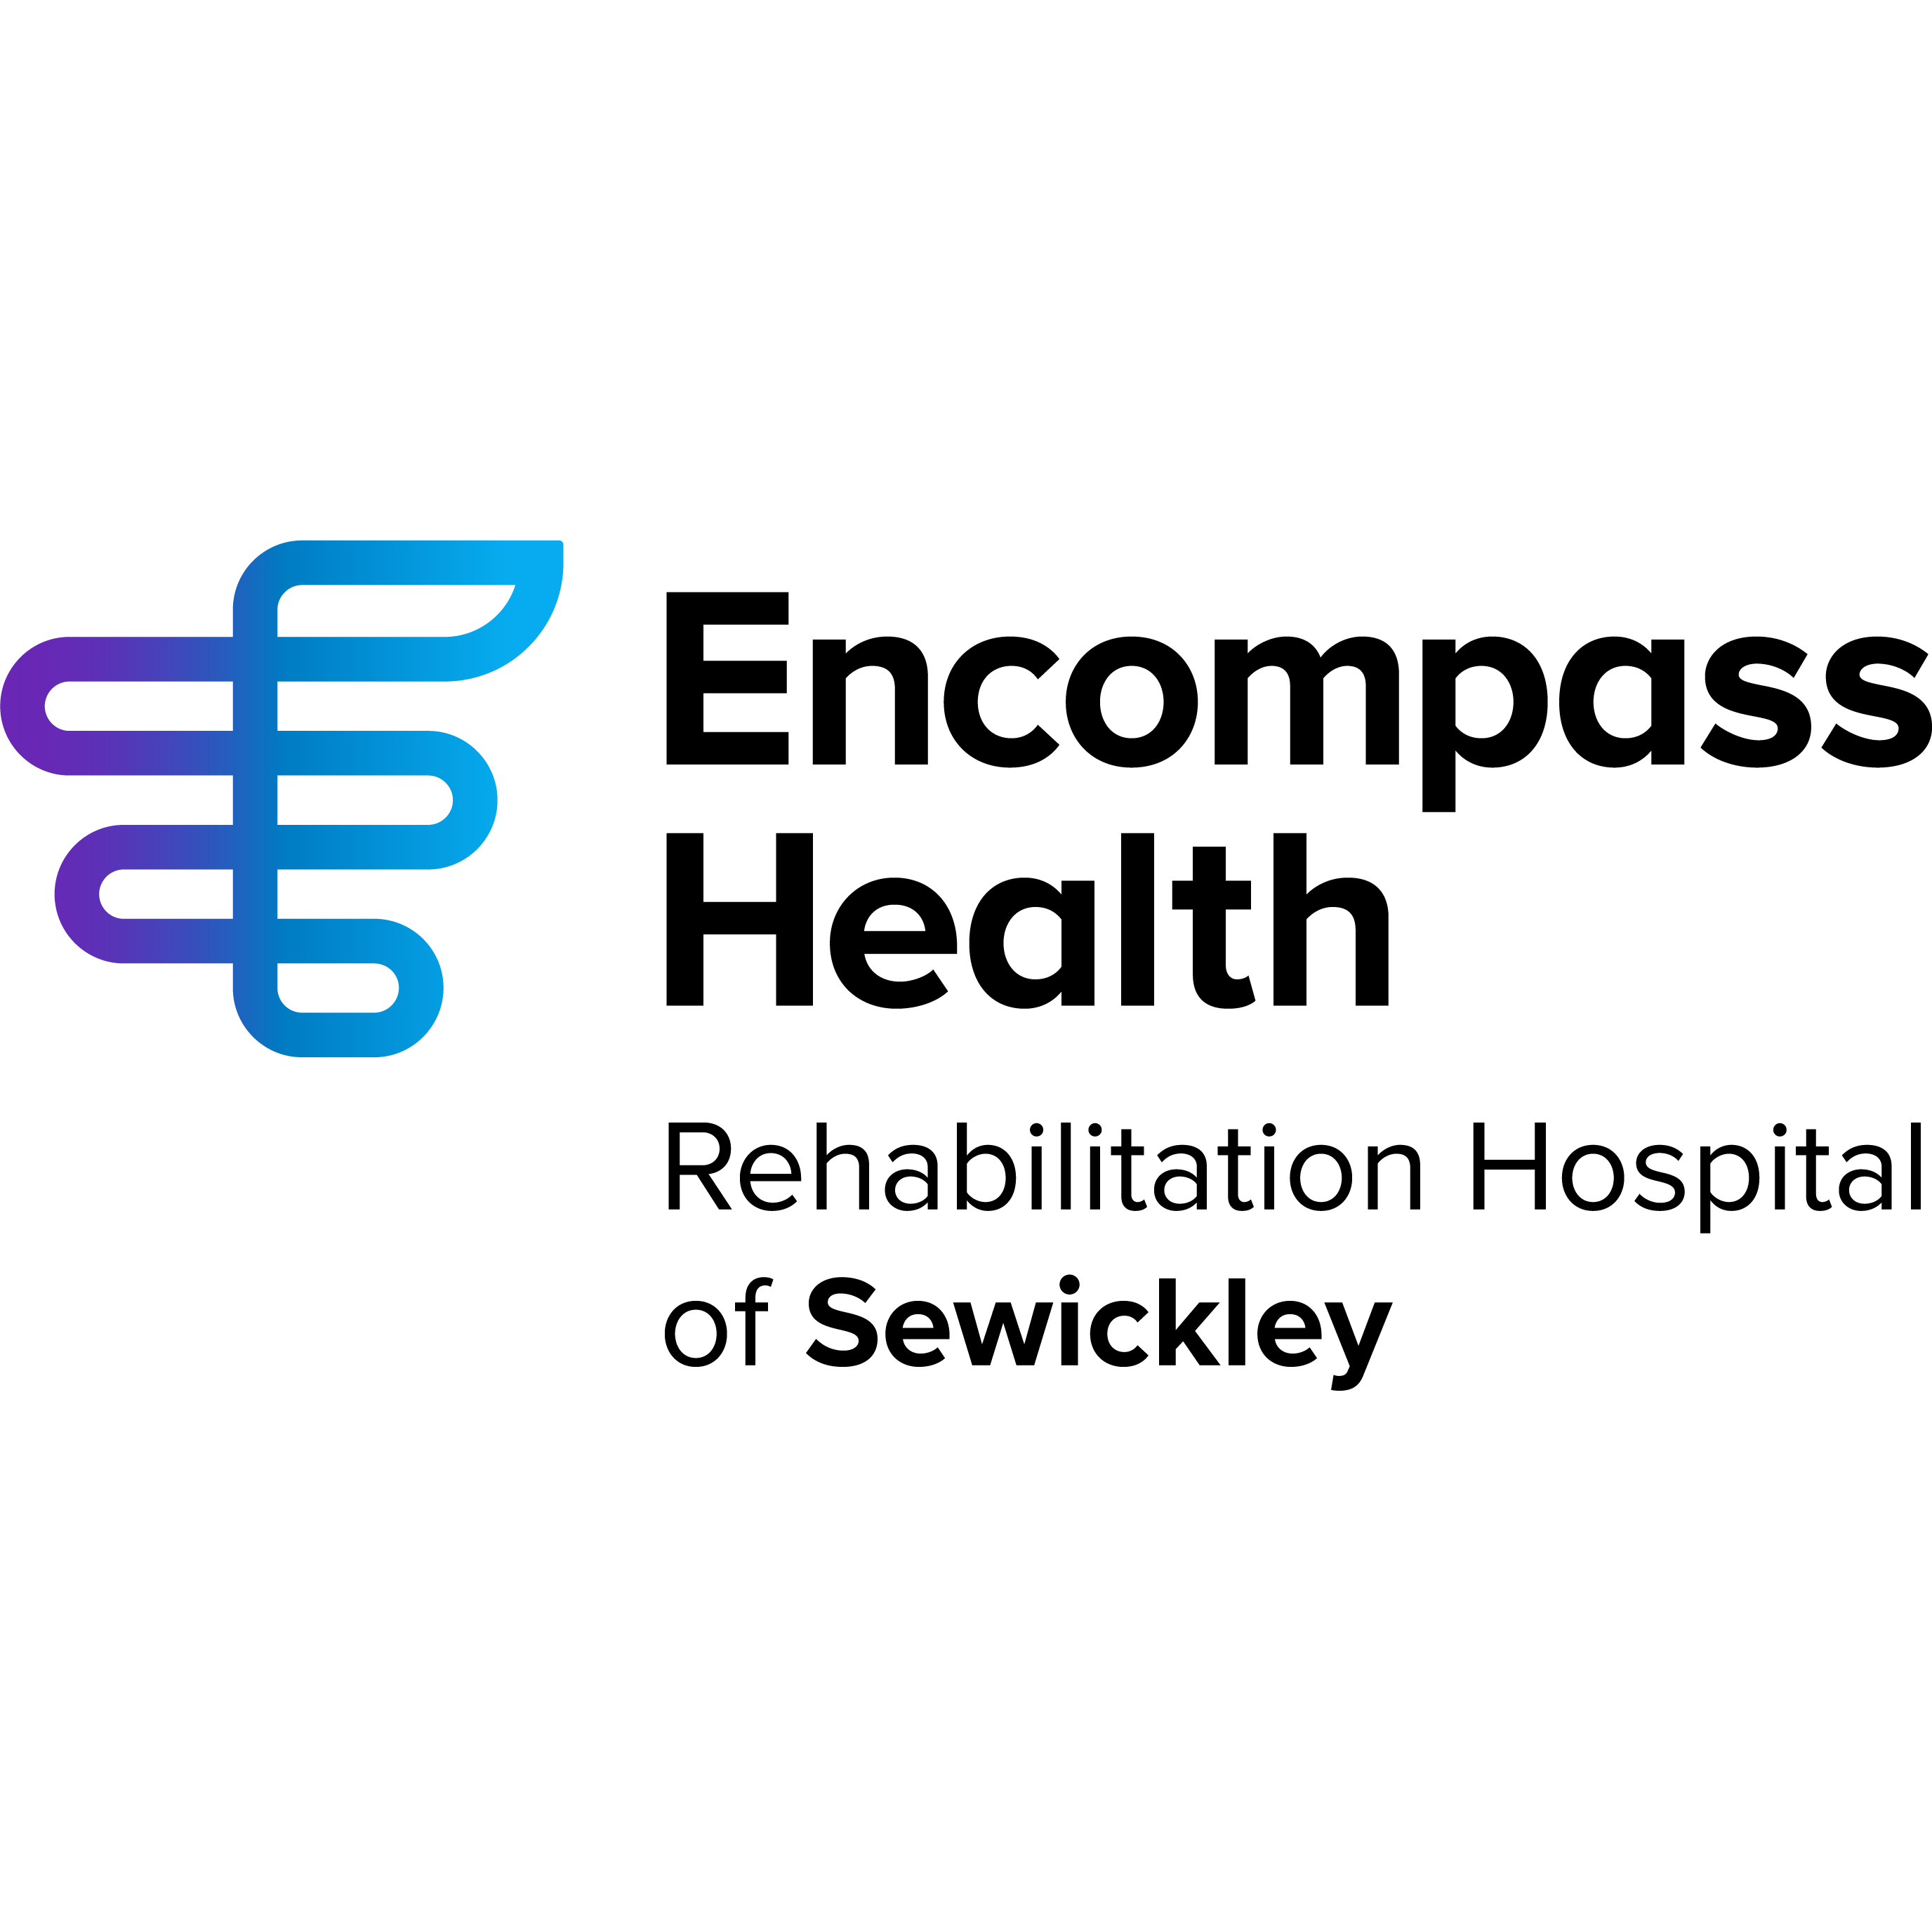 Encompass Health Rehabilitation Hospital of Sewickley